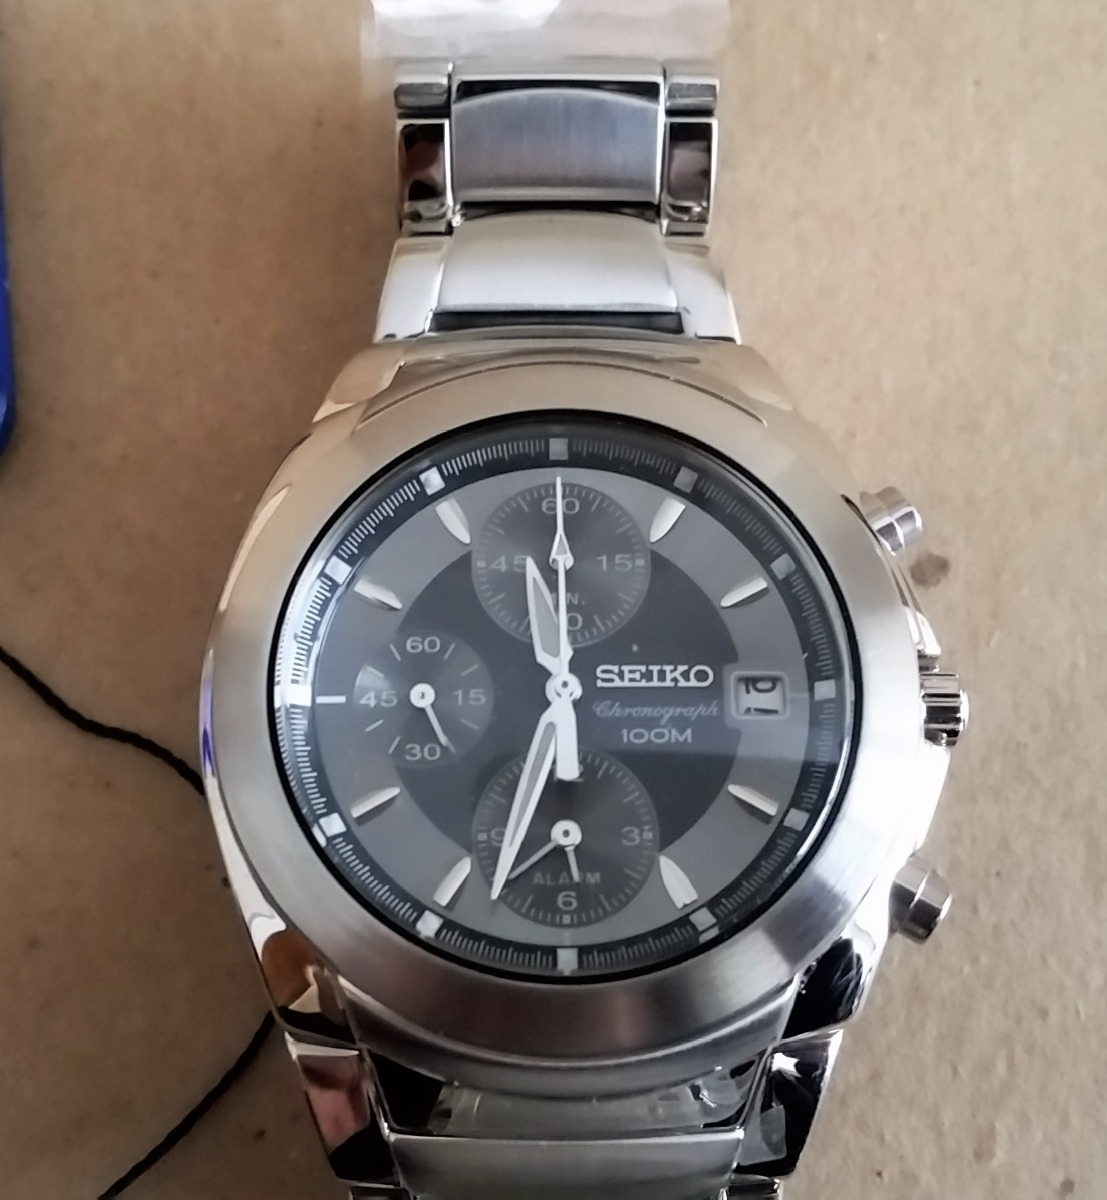 a2068f64fce tk0v relógio seiko chronograph watch sna421p1 cinza. Carregando zoom.